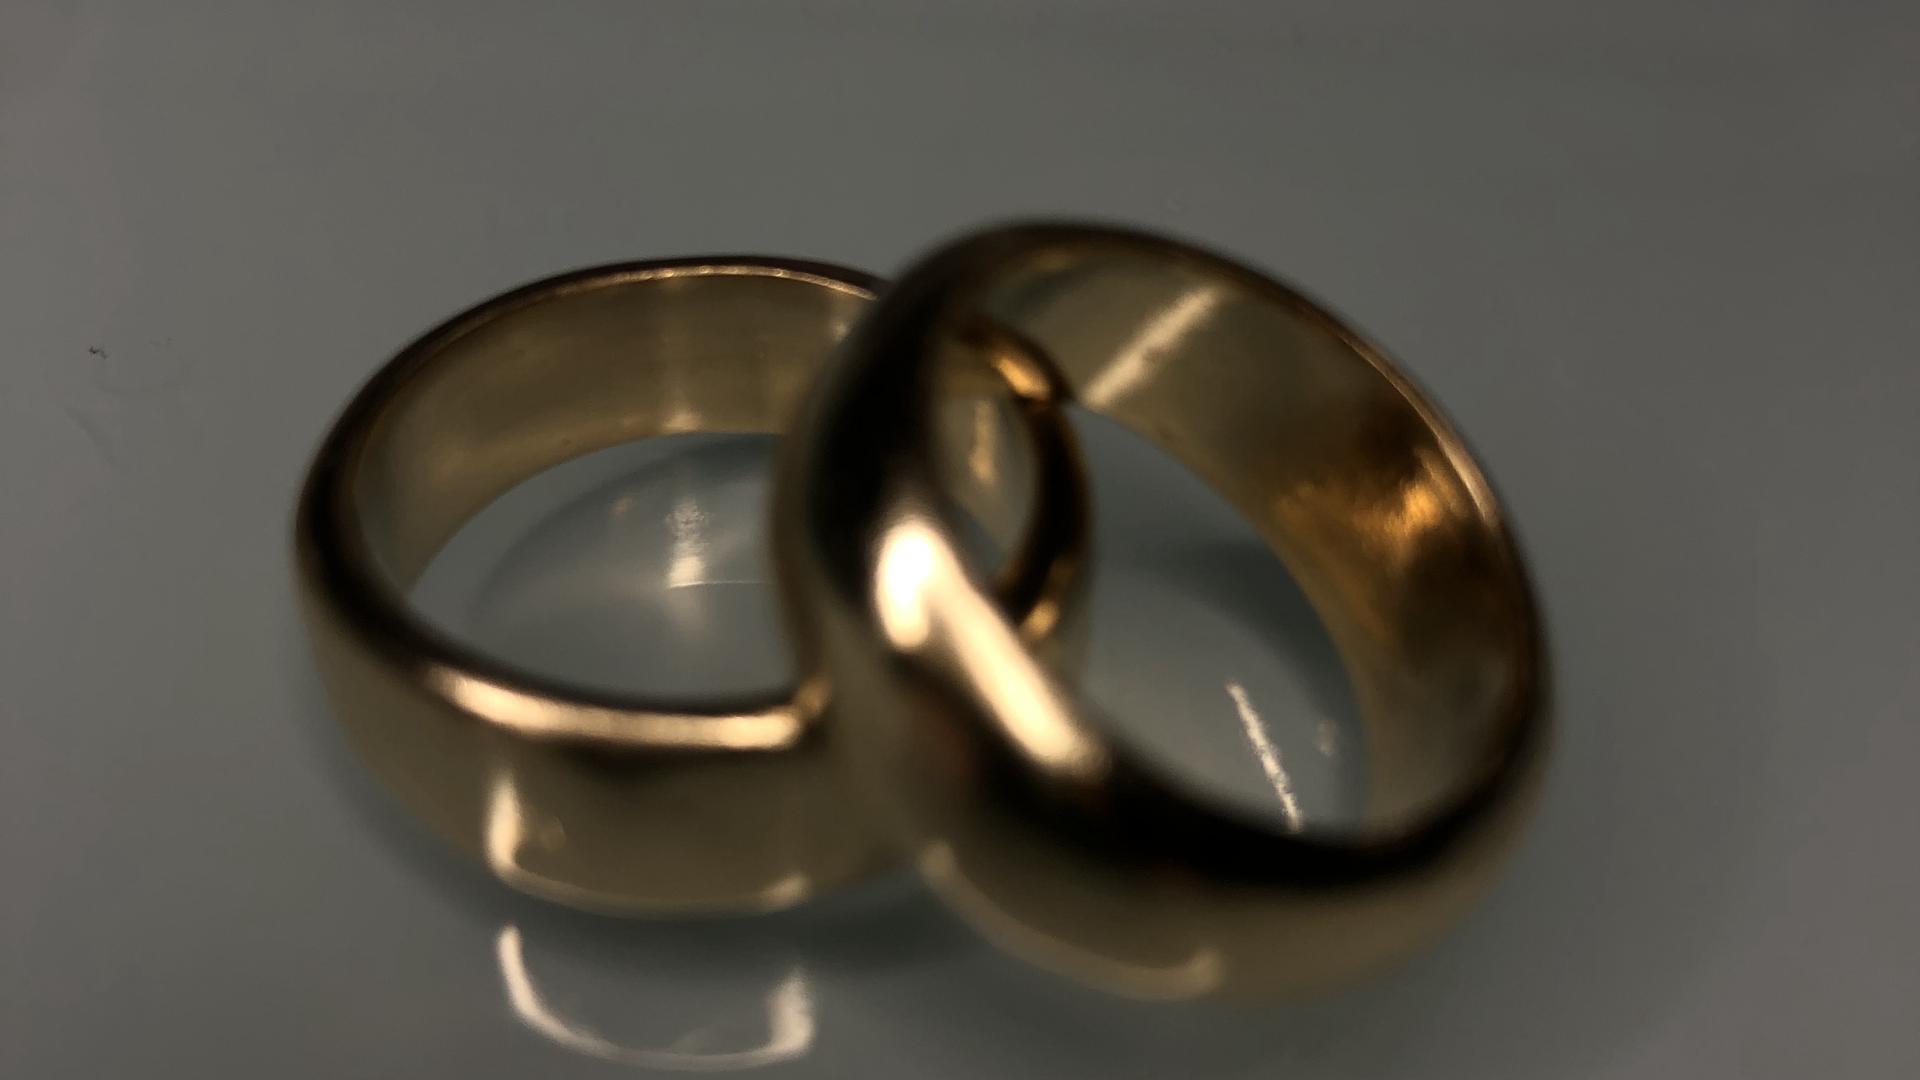 Custom wedding bands in 18k yellow gold